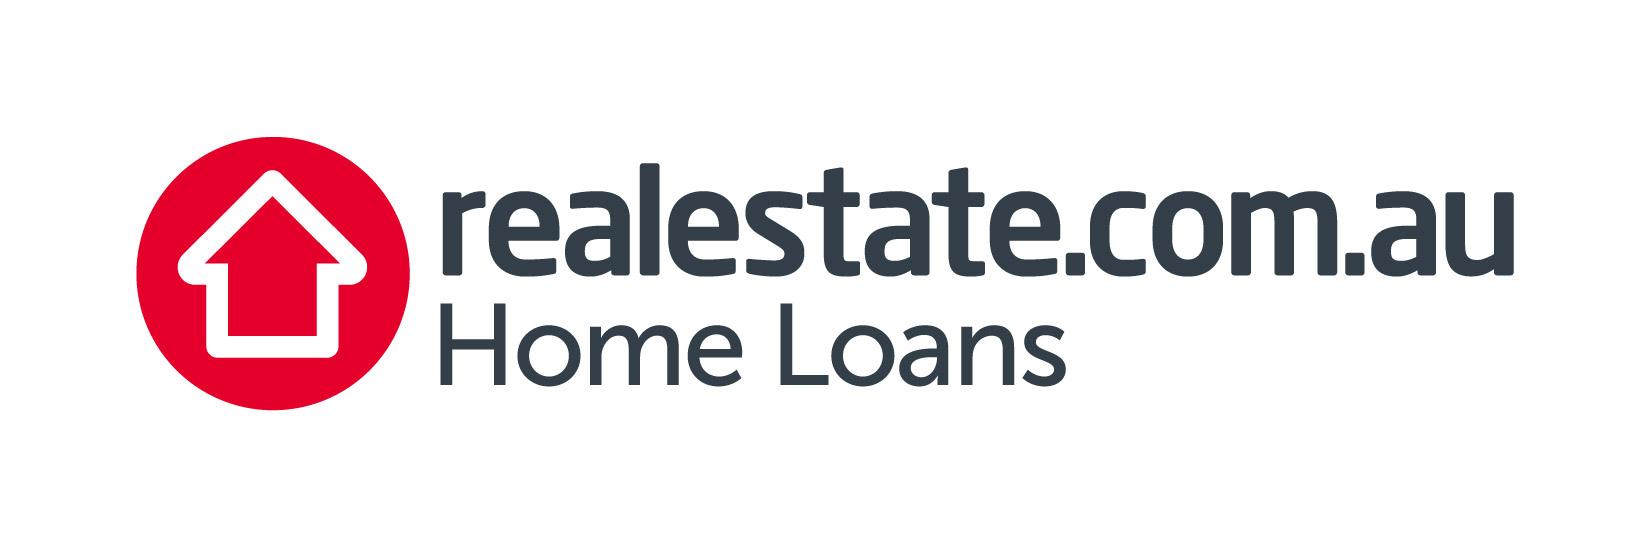 Real estate home logo